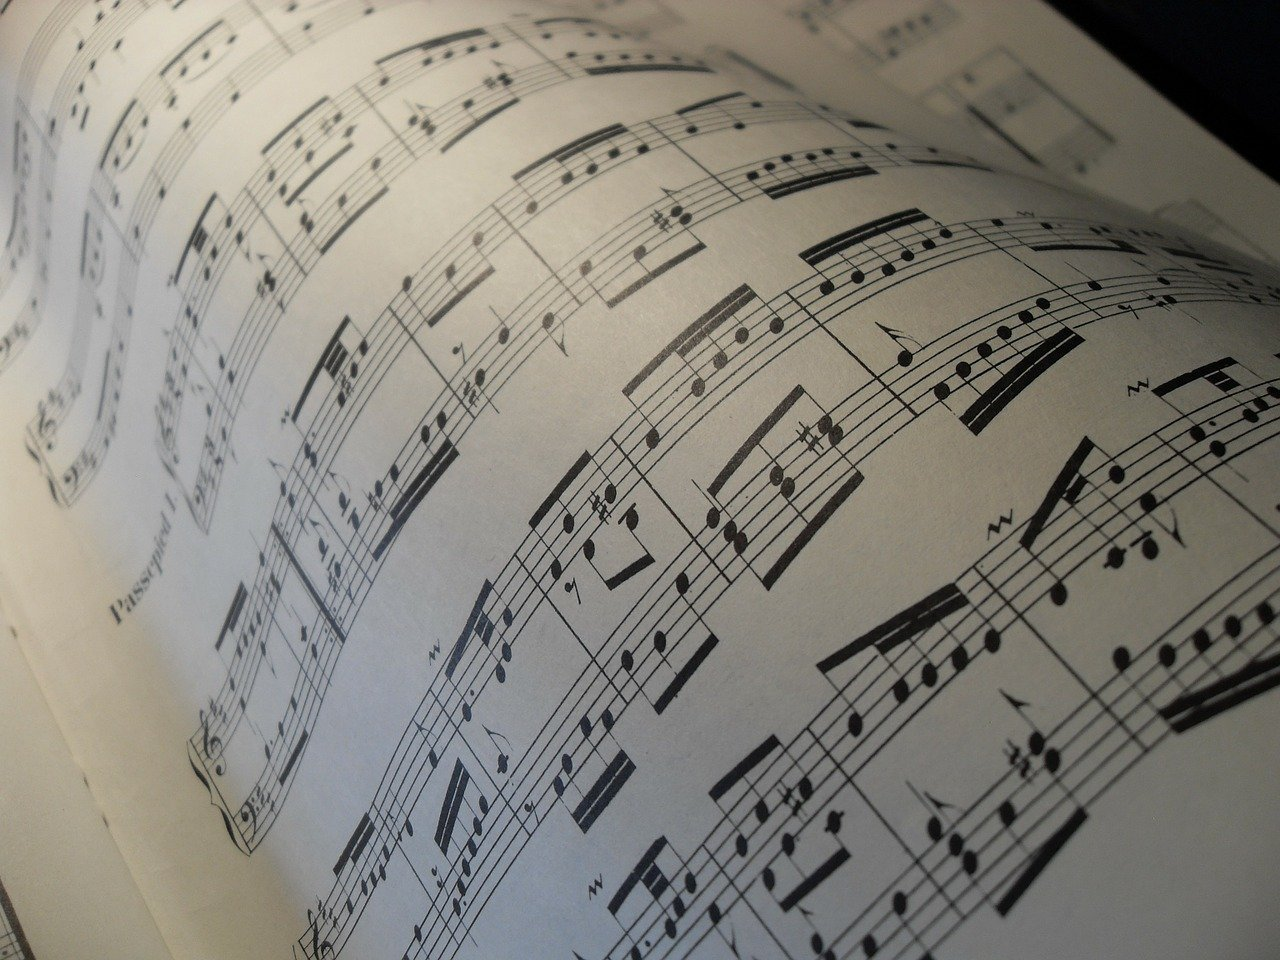 musica, para, funerales, musica bodas, madrid, soprano bodas, soprano funerales, soprano misa funeral, violin funeral